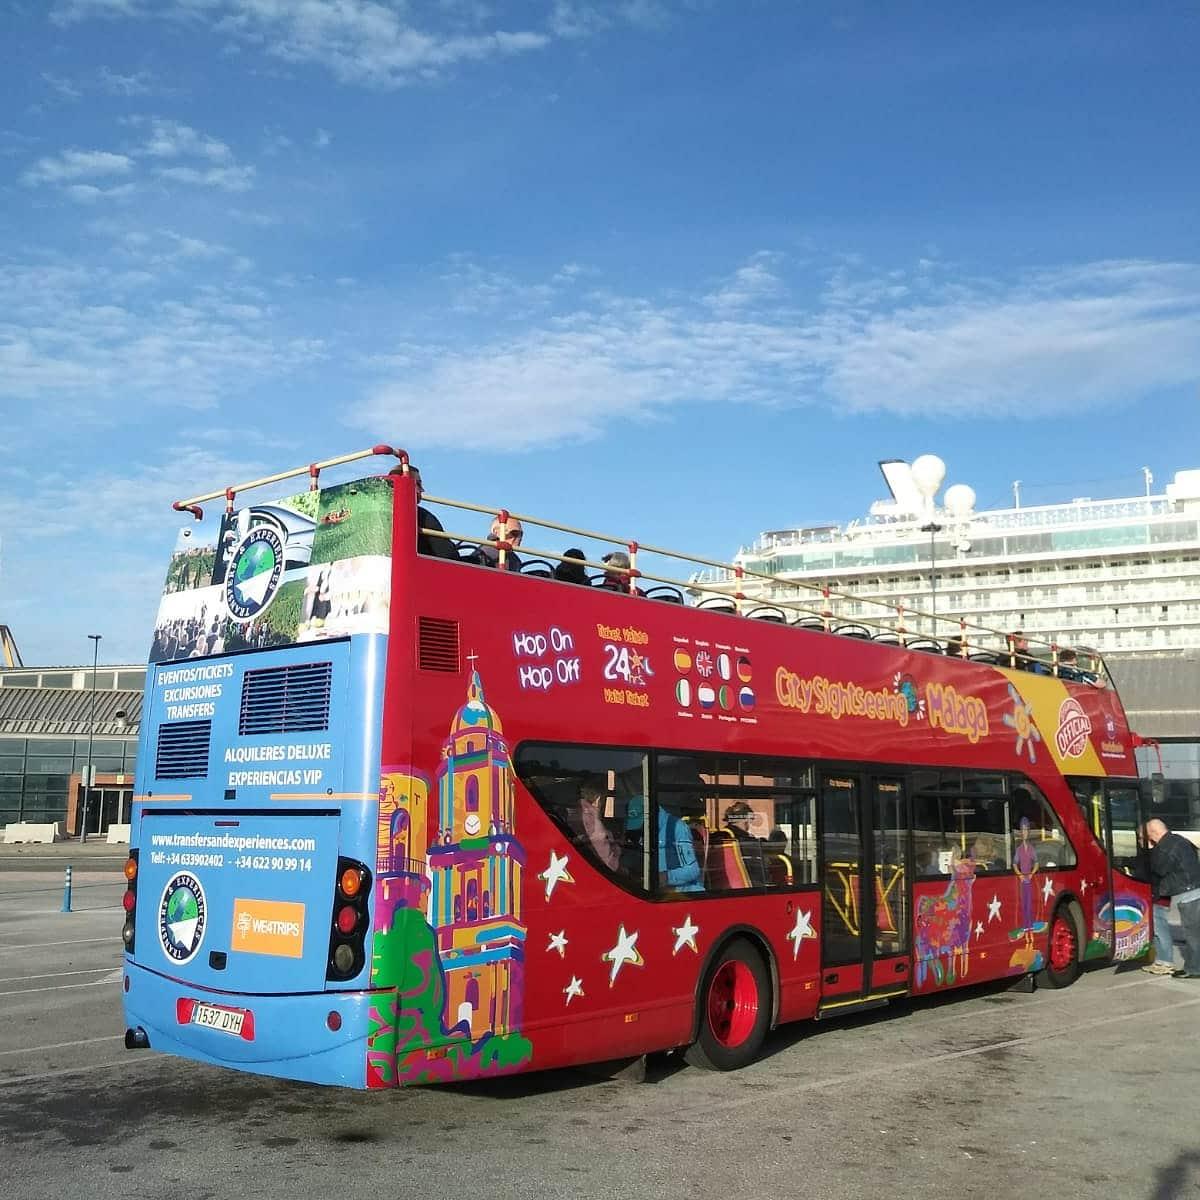 Tour por Benalmádena en autobus turístico - Transfers and Experiences